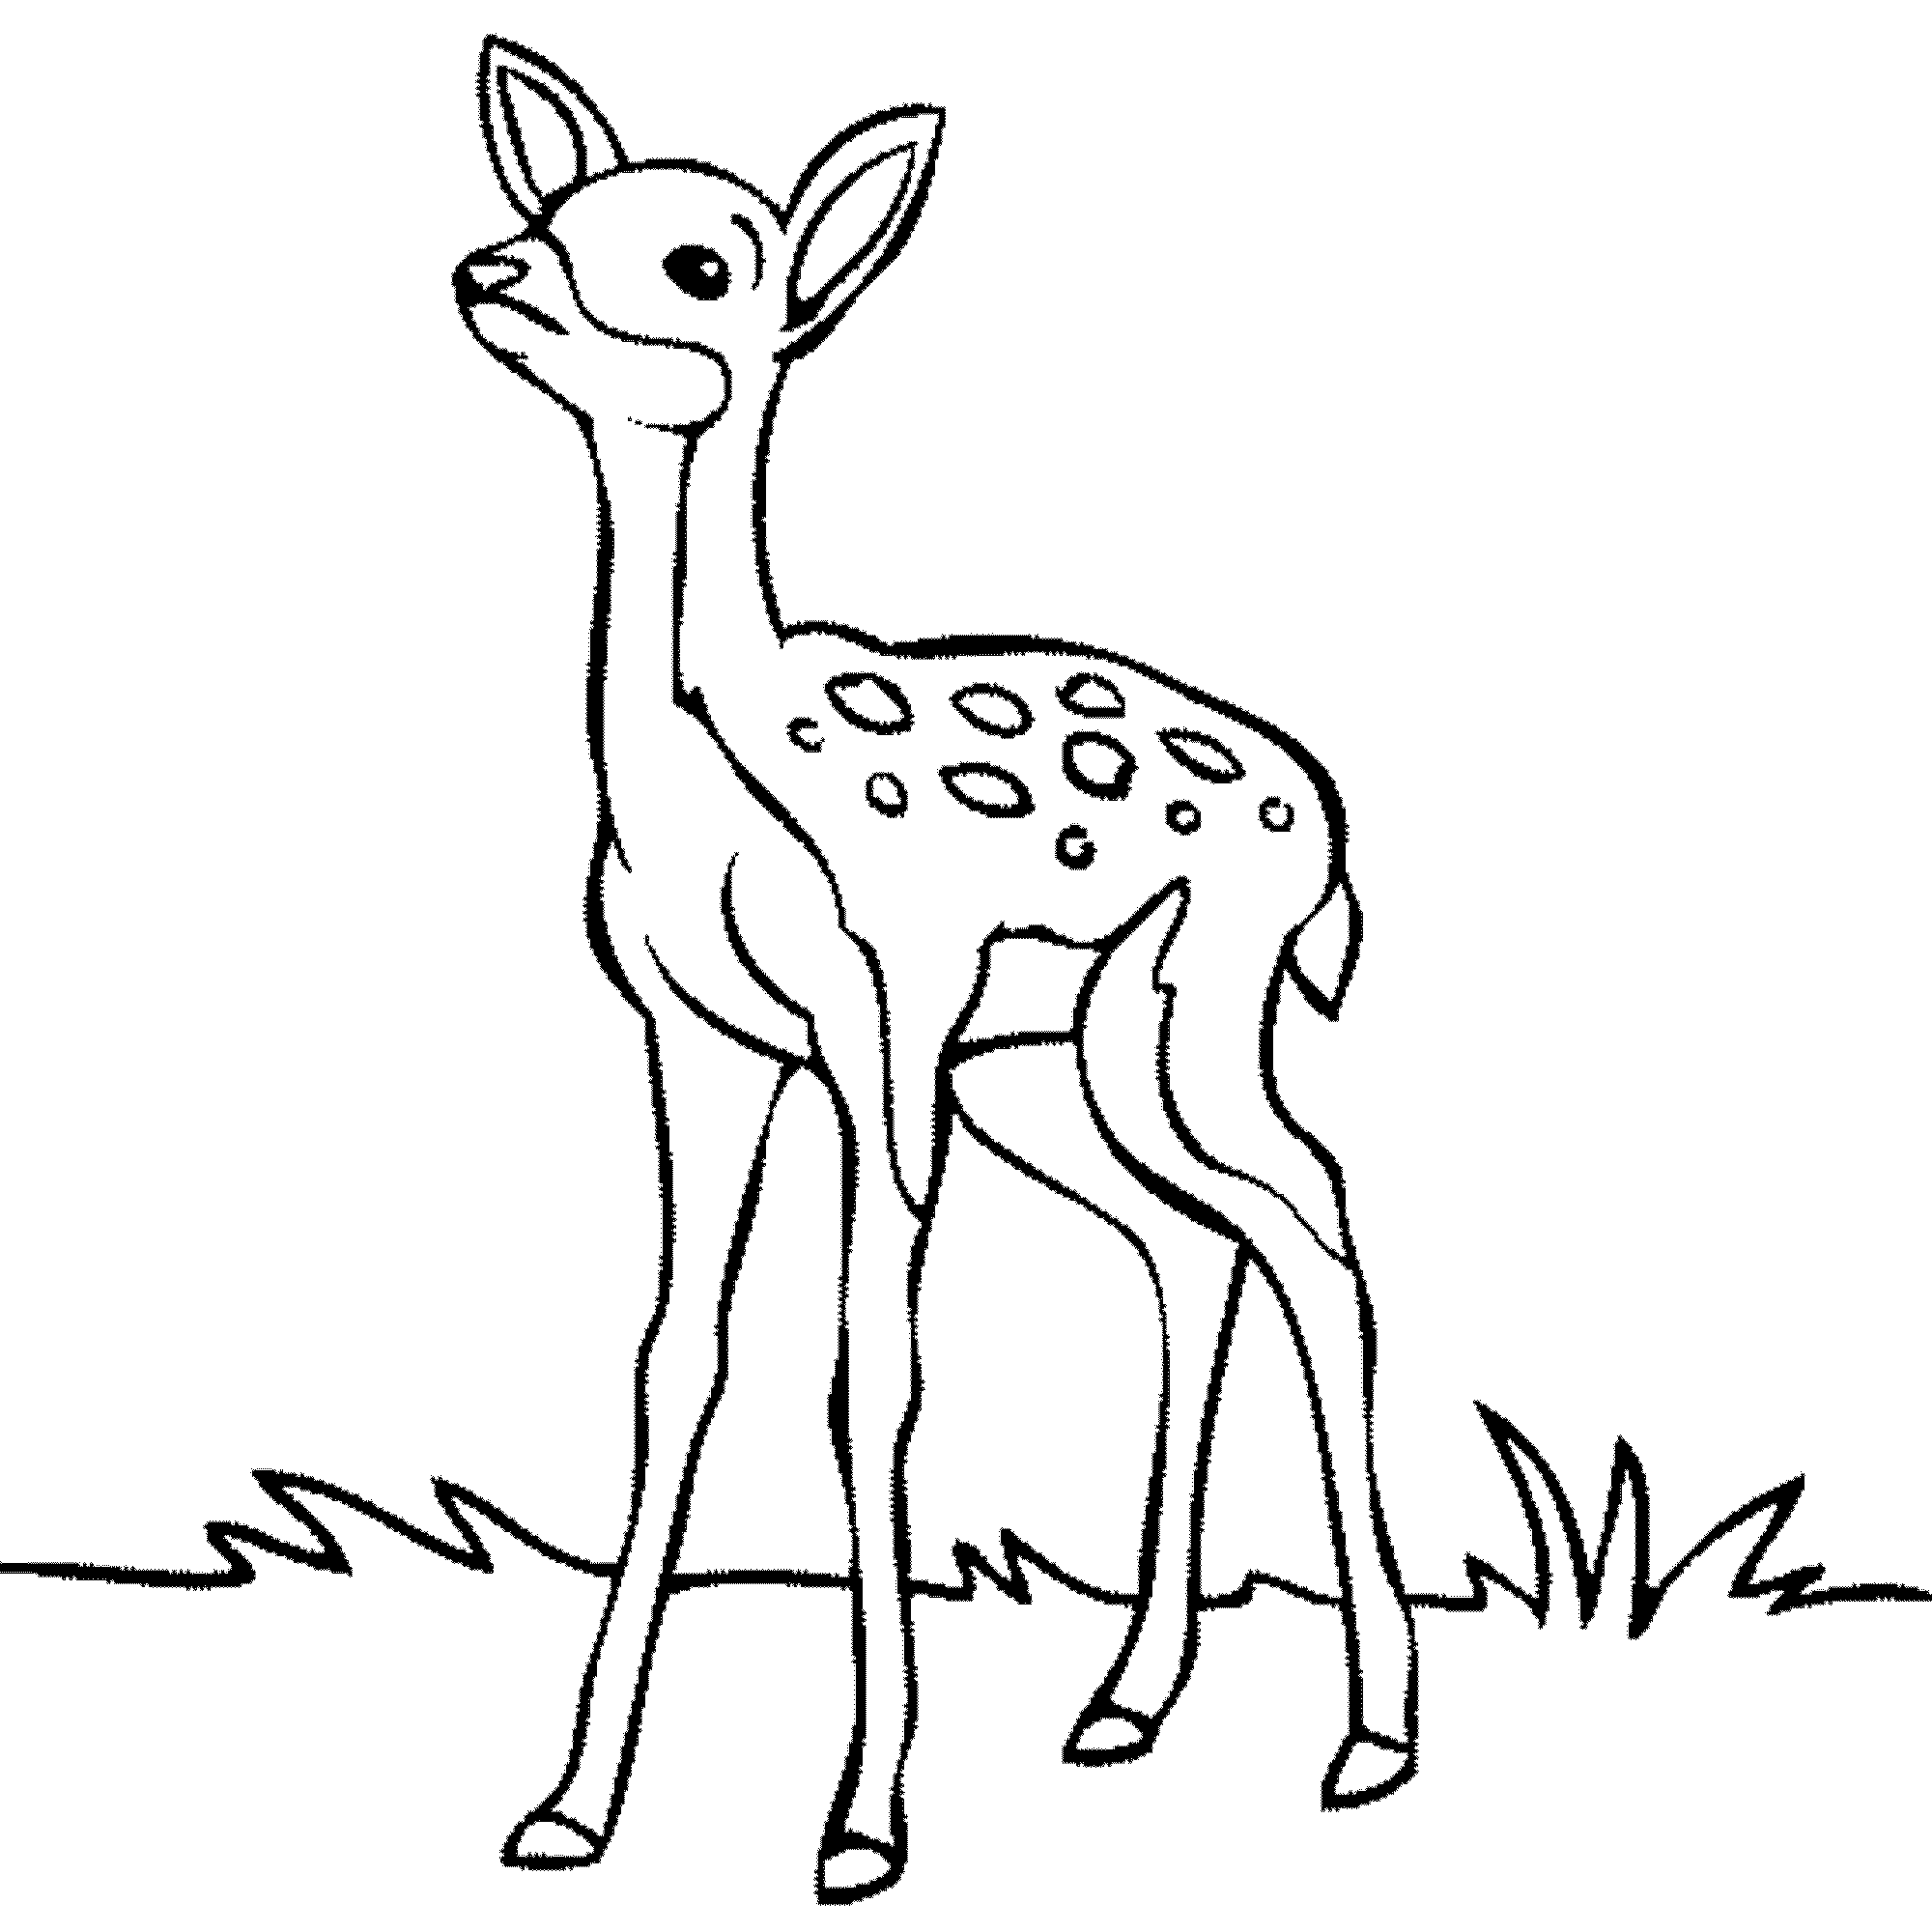 buck coloring pages print download deer coloring pages for totally coloring pages buck